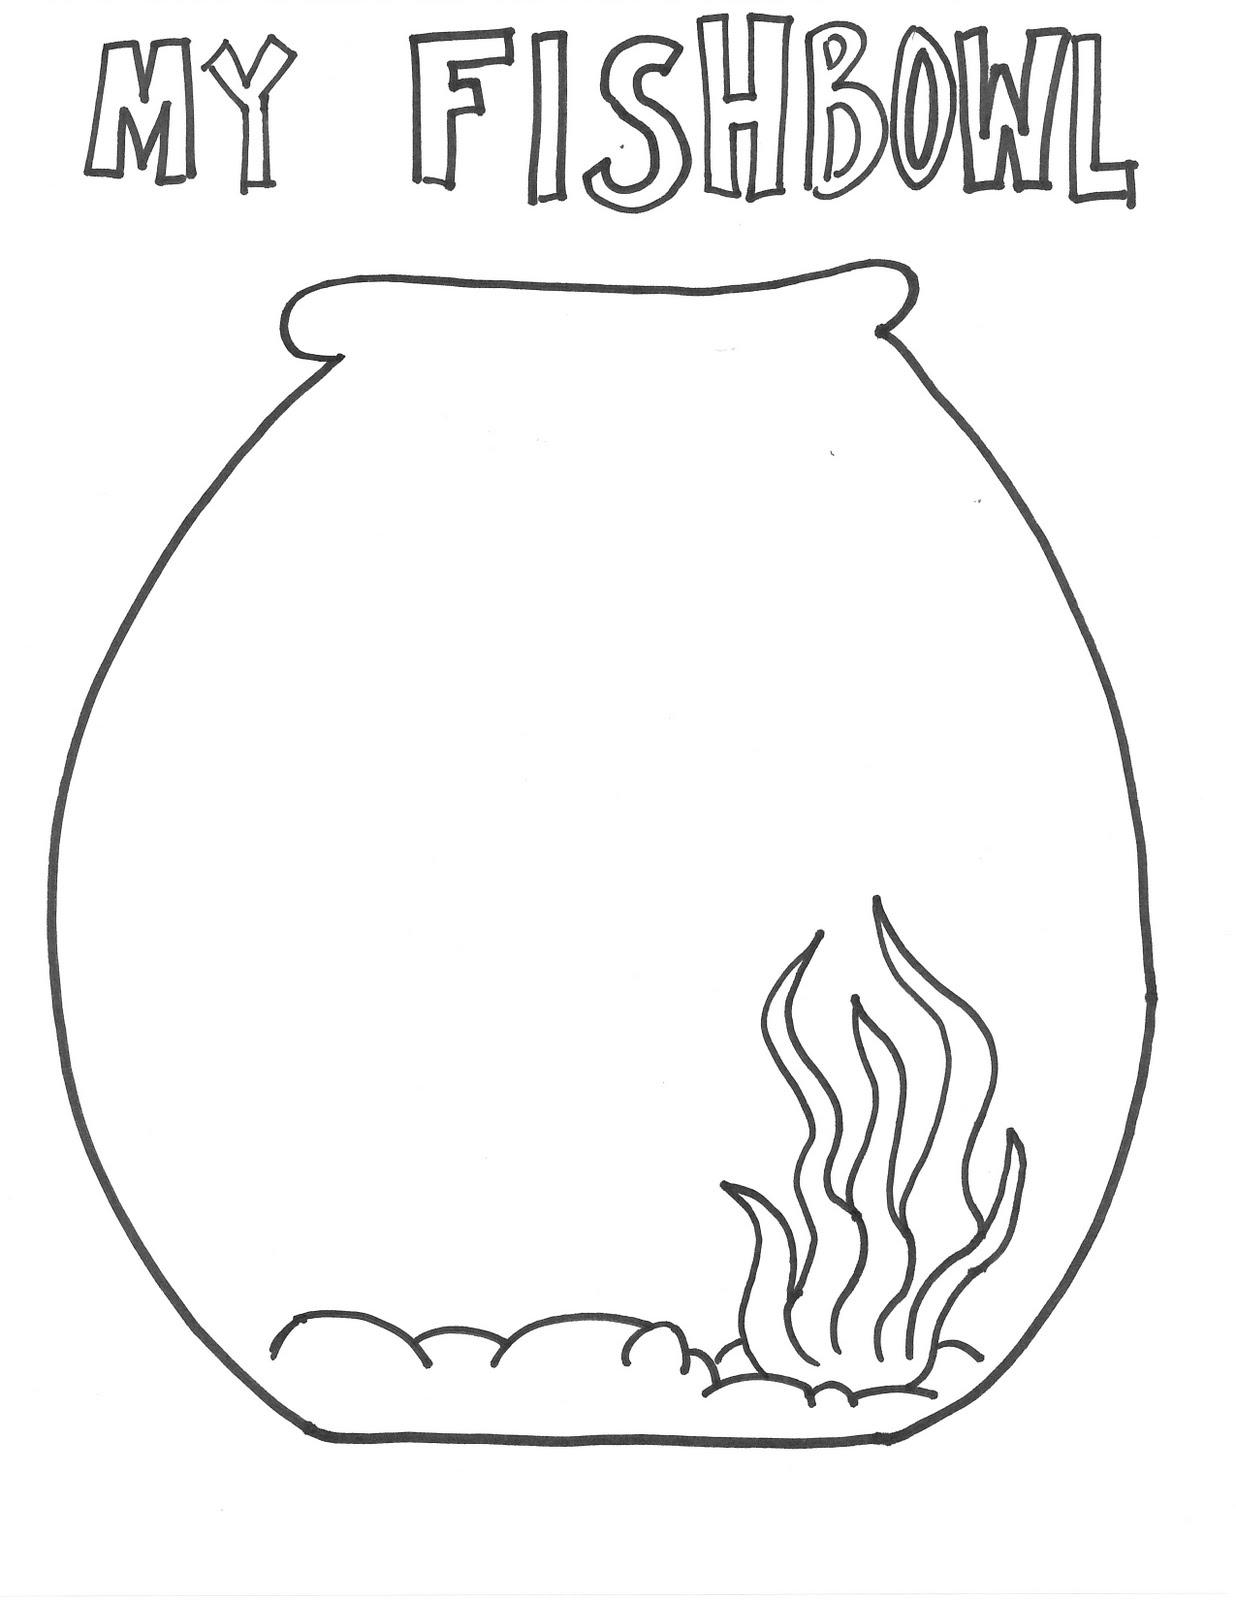 Fish Bowl Coloring Page N7 Free Image